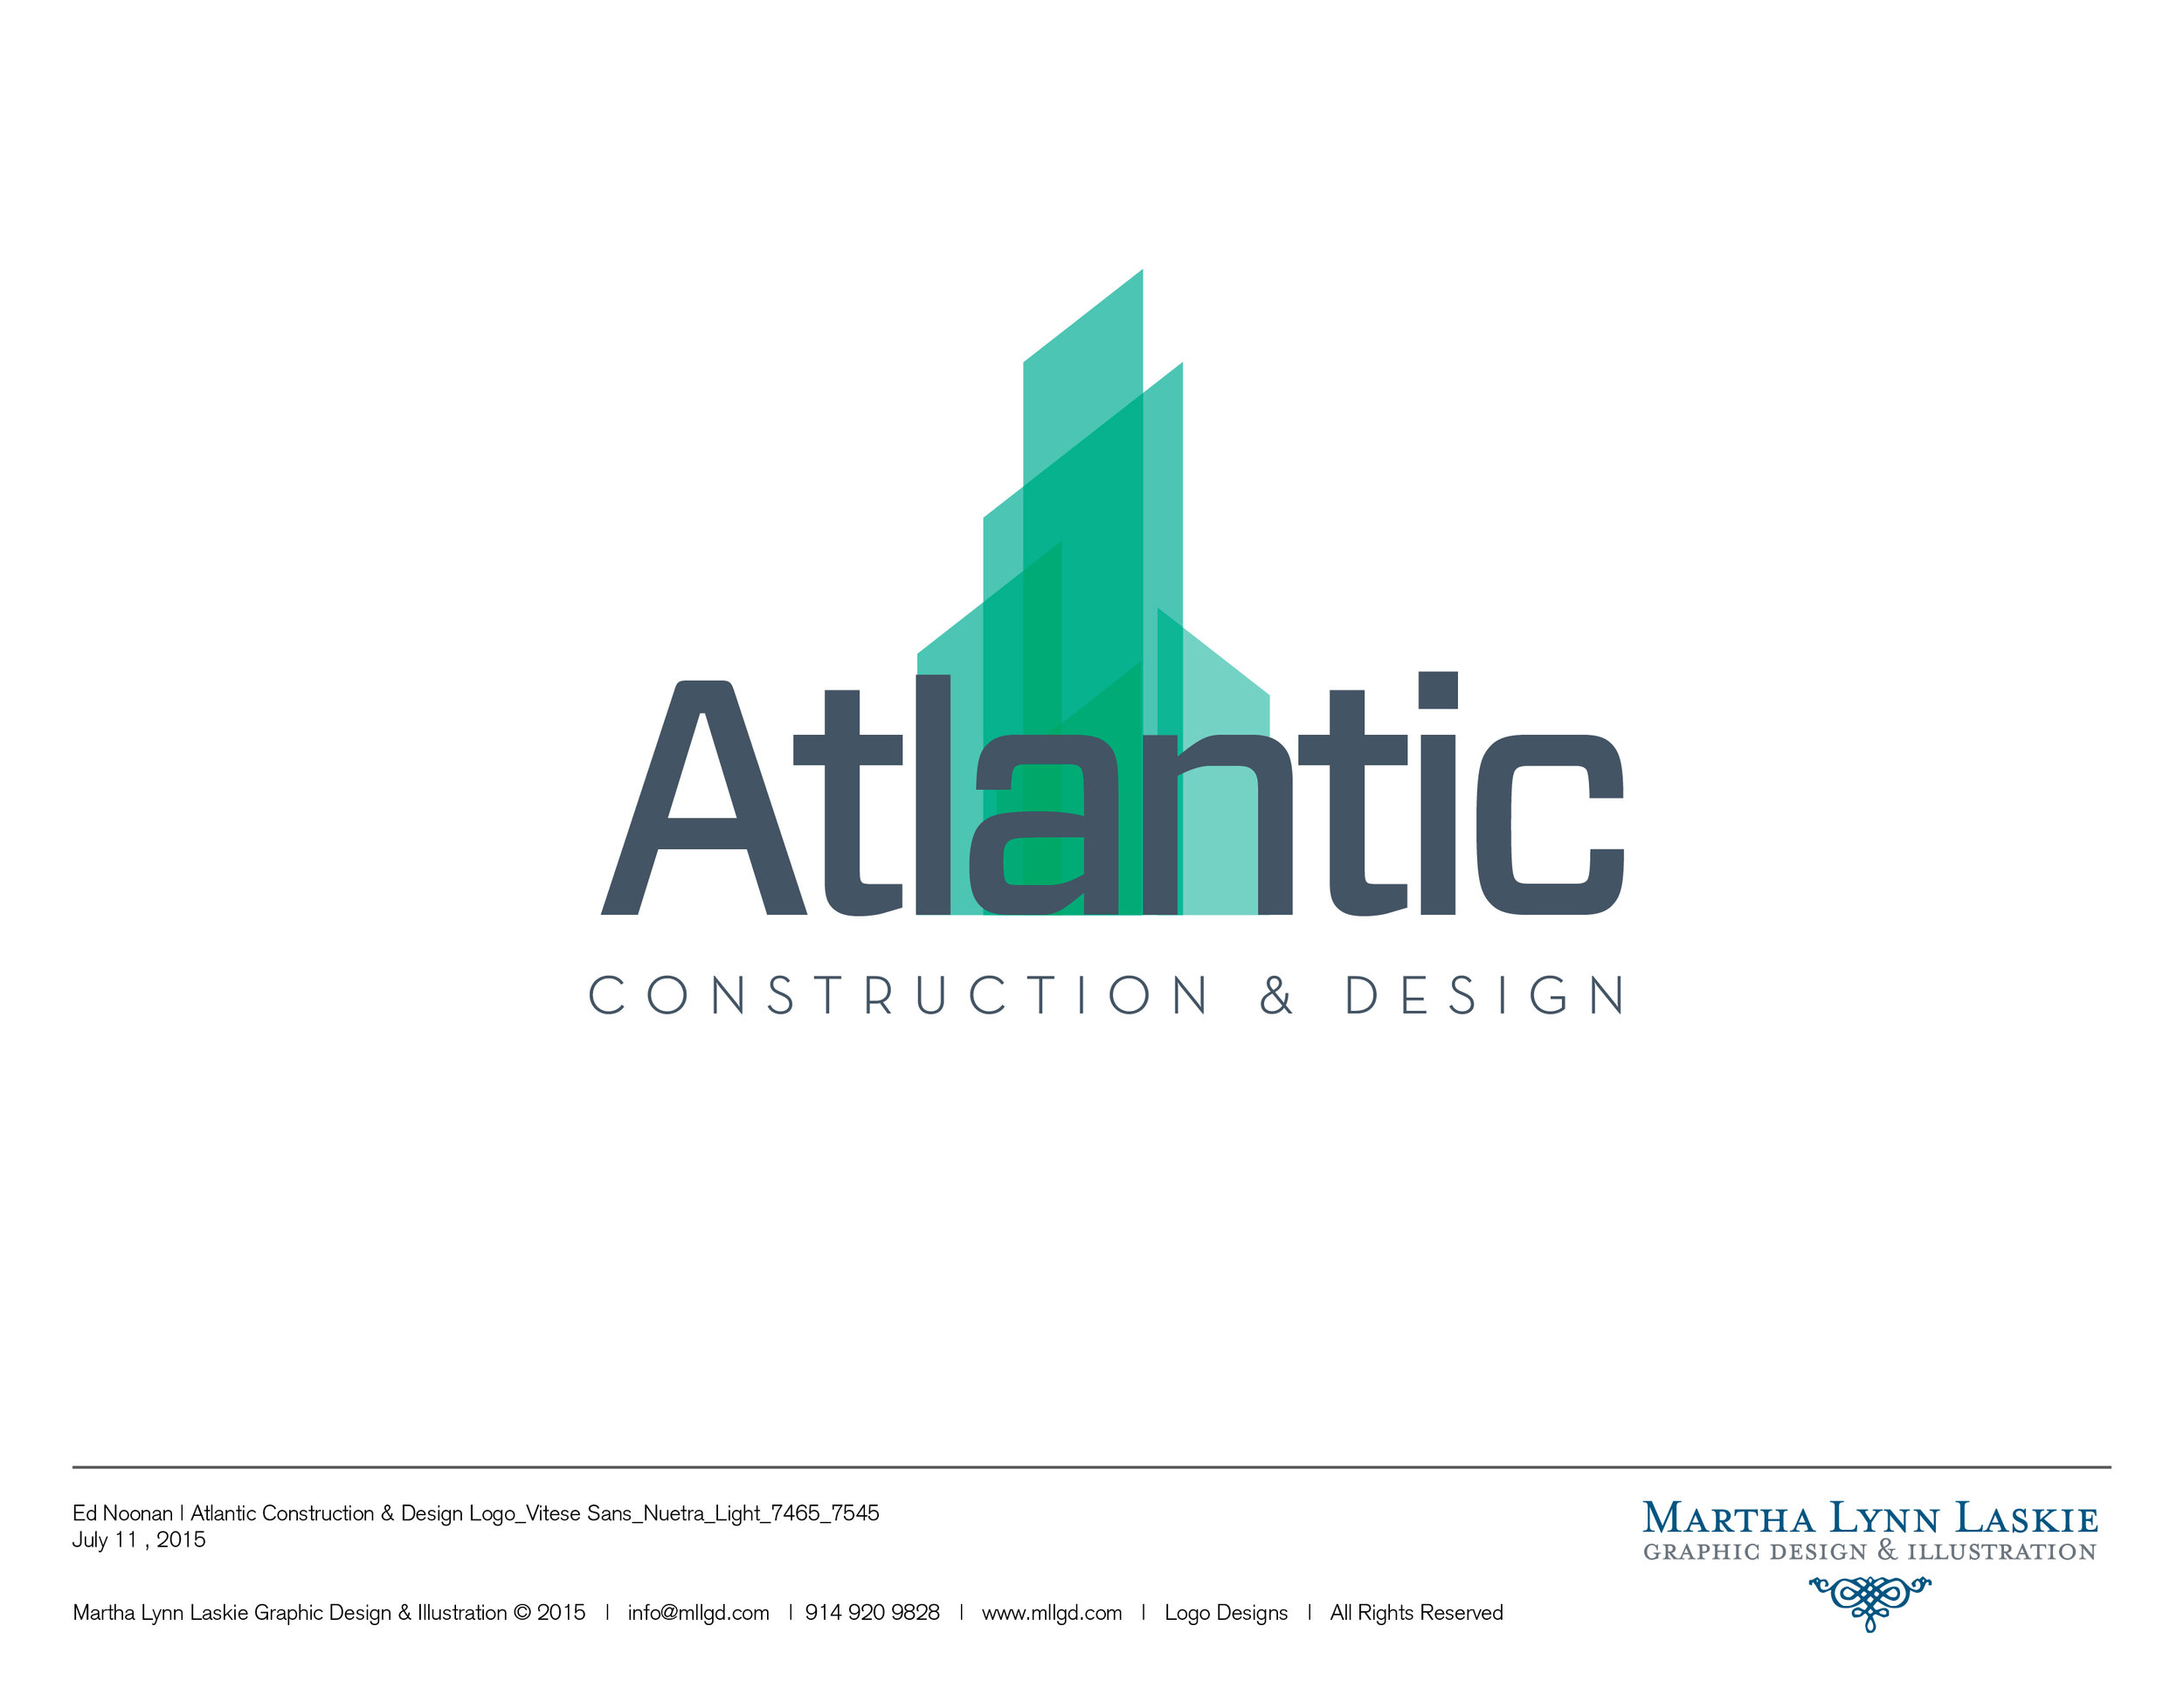 00000309 Atlantic Construction & Design_FINAL-01.jpg